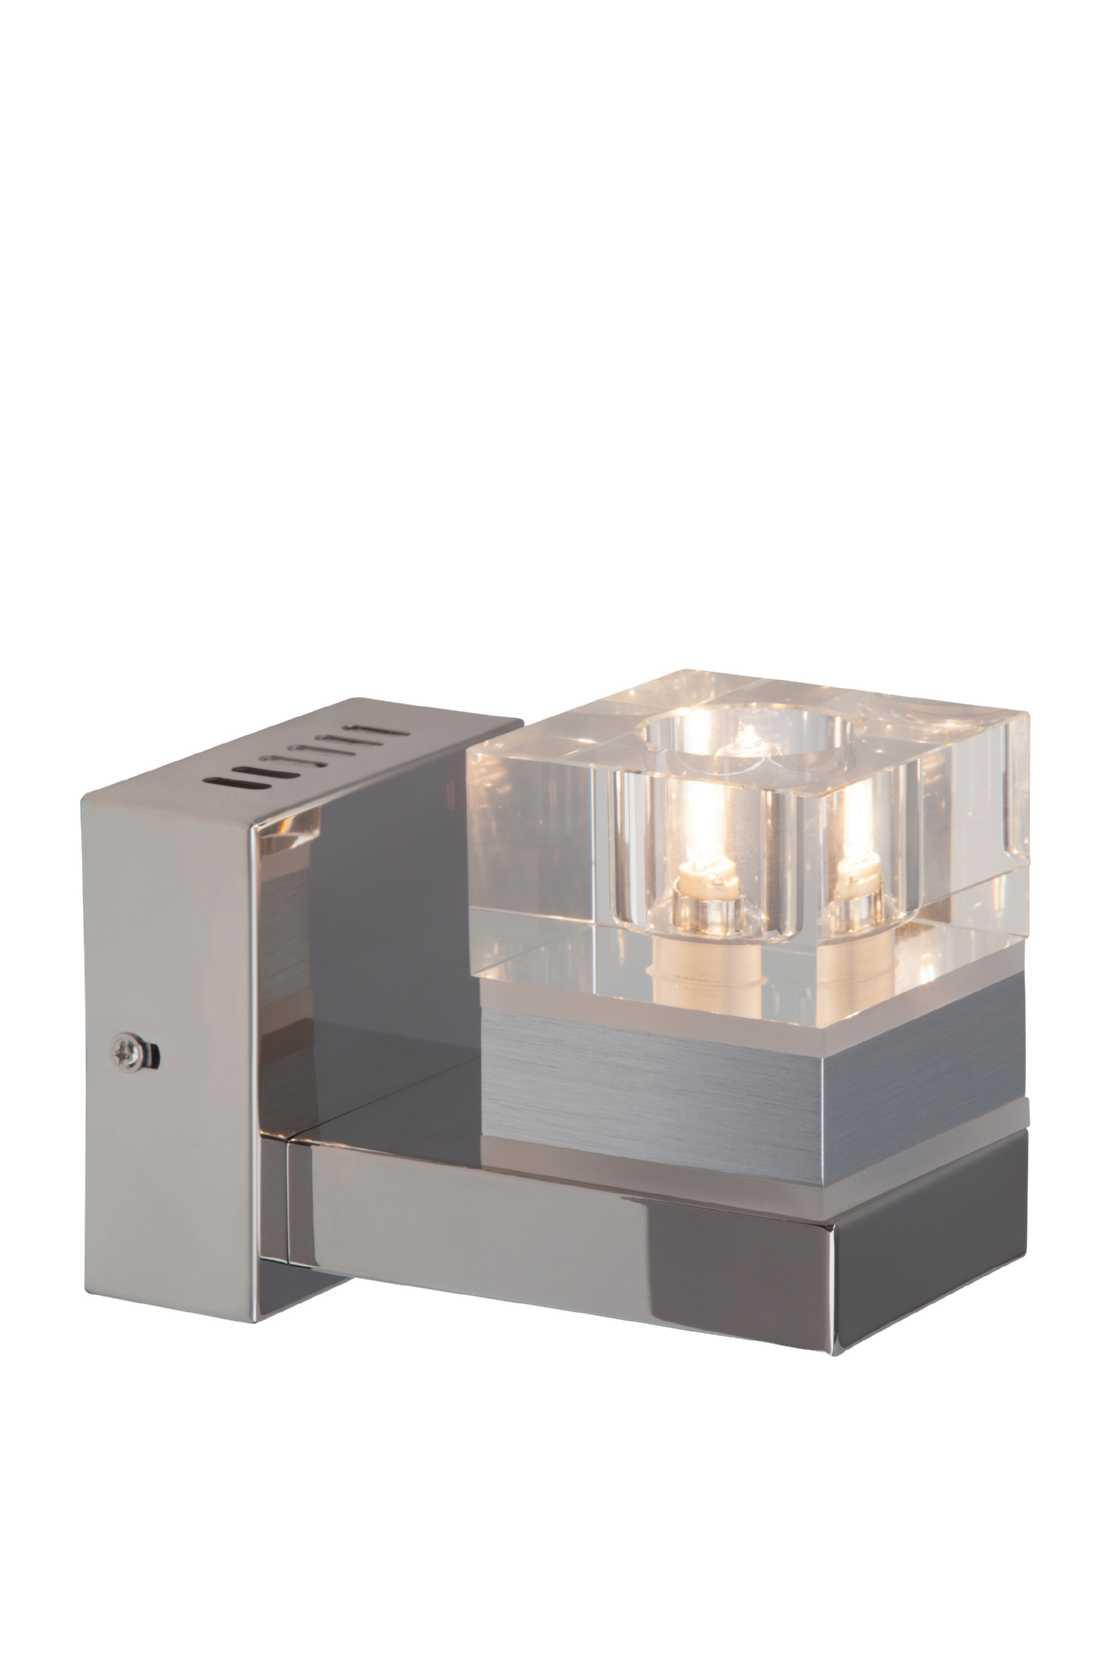 Светильник настенный TalonБра<br>&amp;lt;div&amp;gt;Вид цоколя: G9&amp;lt;/div&amp;gt;&amp;lt;div&amp;gt;Мощность лампы: 40W&amp;lt;/div&amp;gt;&amp;lt;div&amp;gt;Количество ламп: 1&amp;lt;/div&amp;gt;&amp;lt;div&amp;gt;Наличие ламп: да&amp;lt;/div&amp;gt;<br><br>Material: Пластик<br>Ширина см: 16<br>Высота см: 17<br>Глубина см: 10